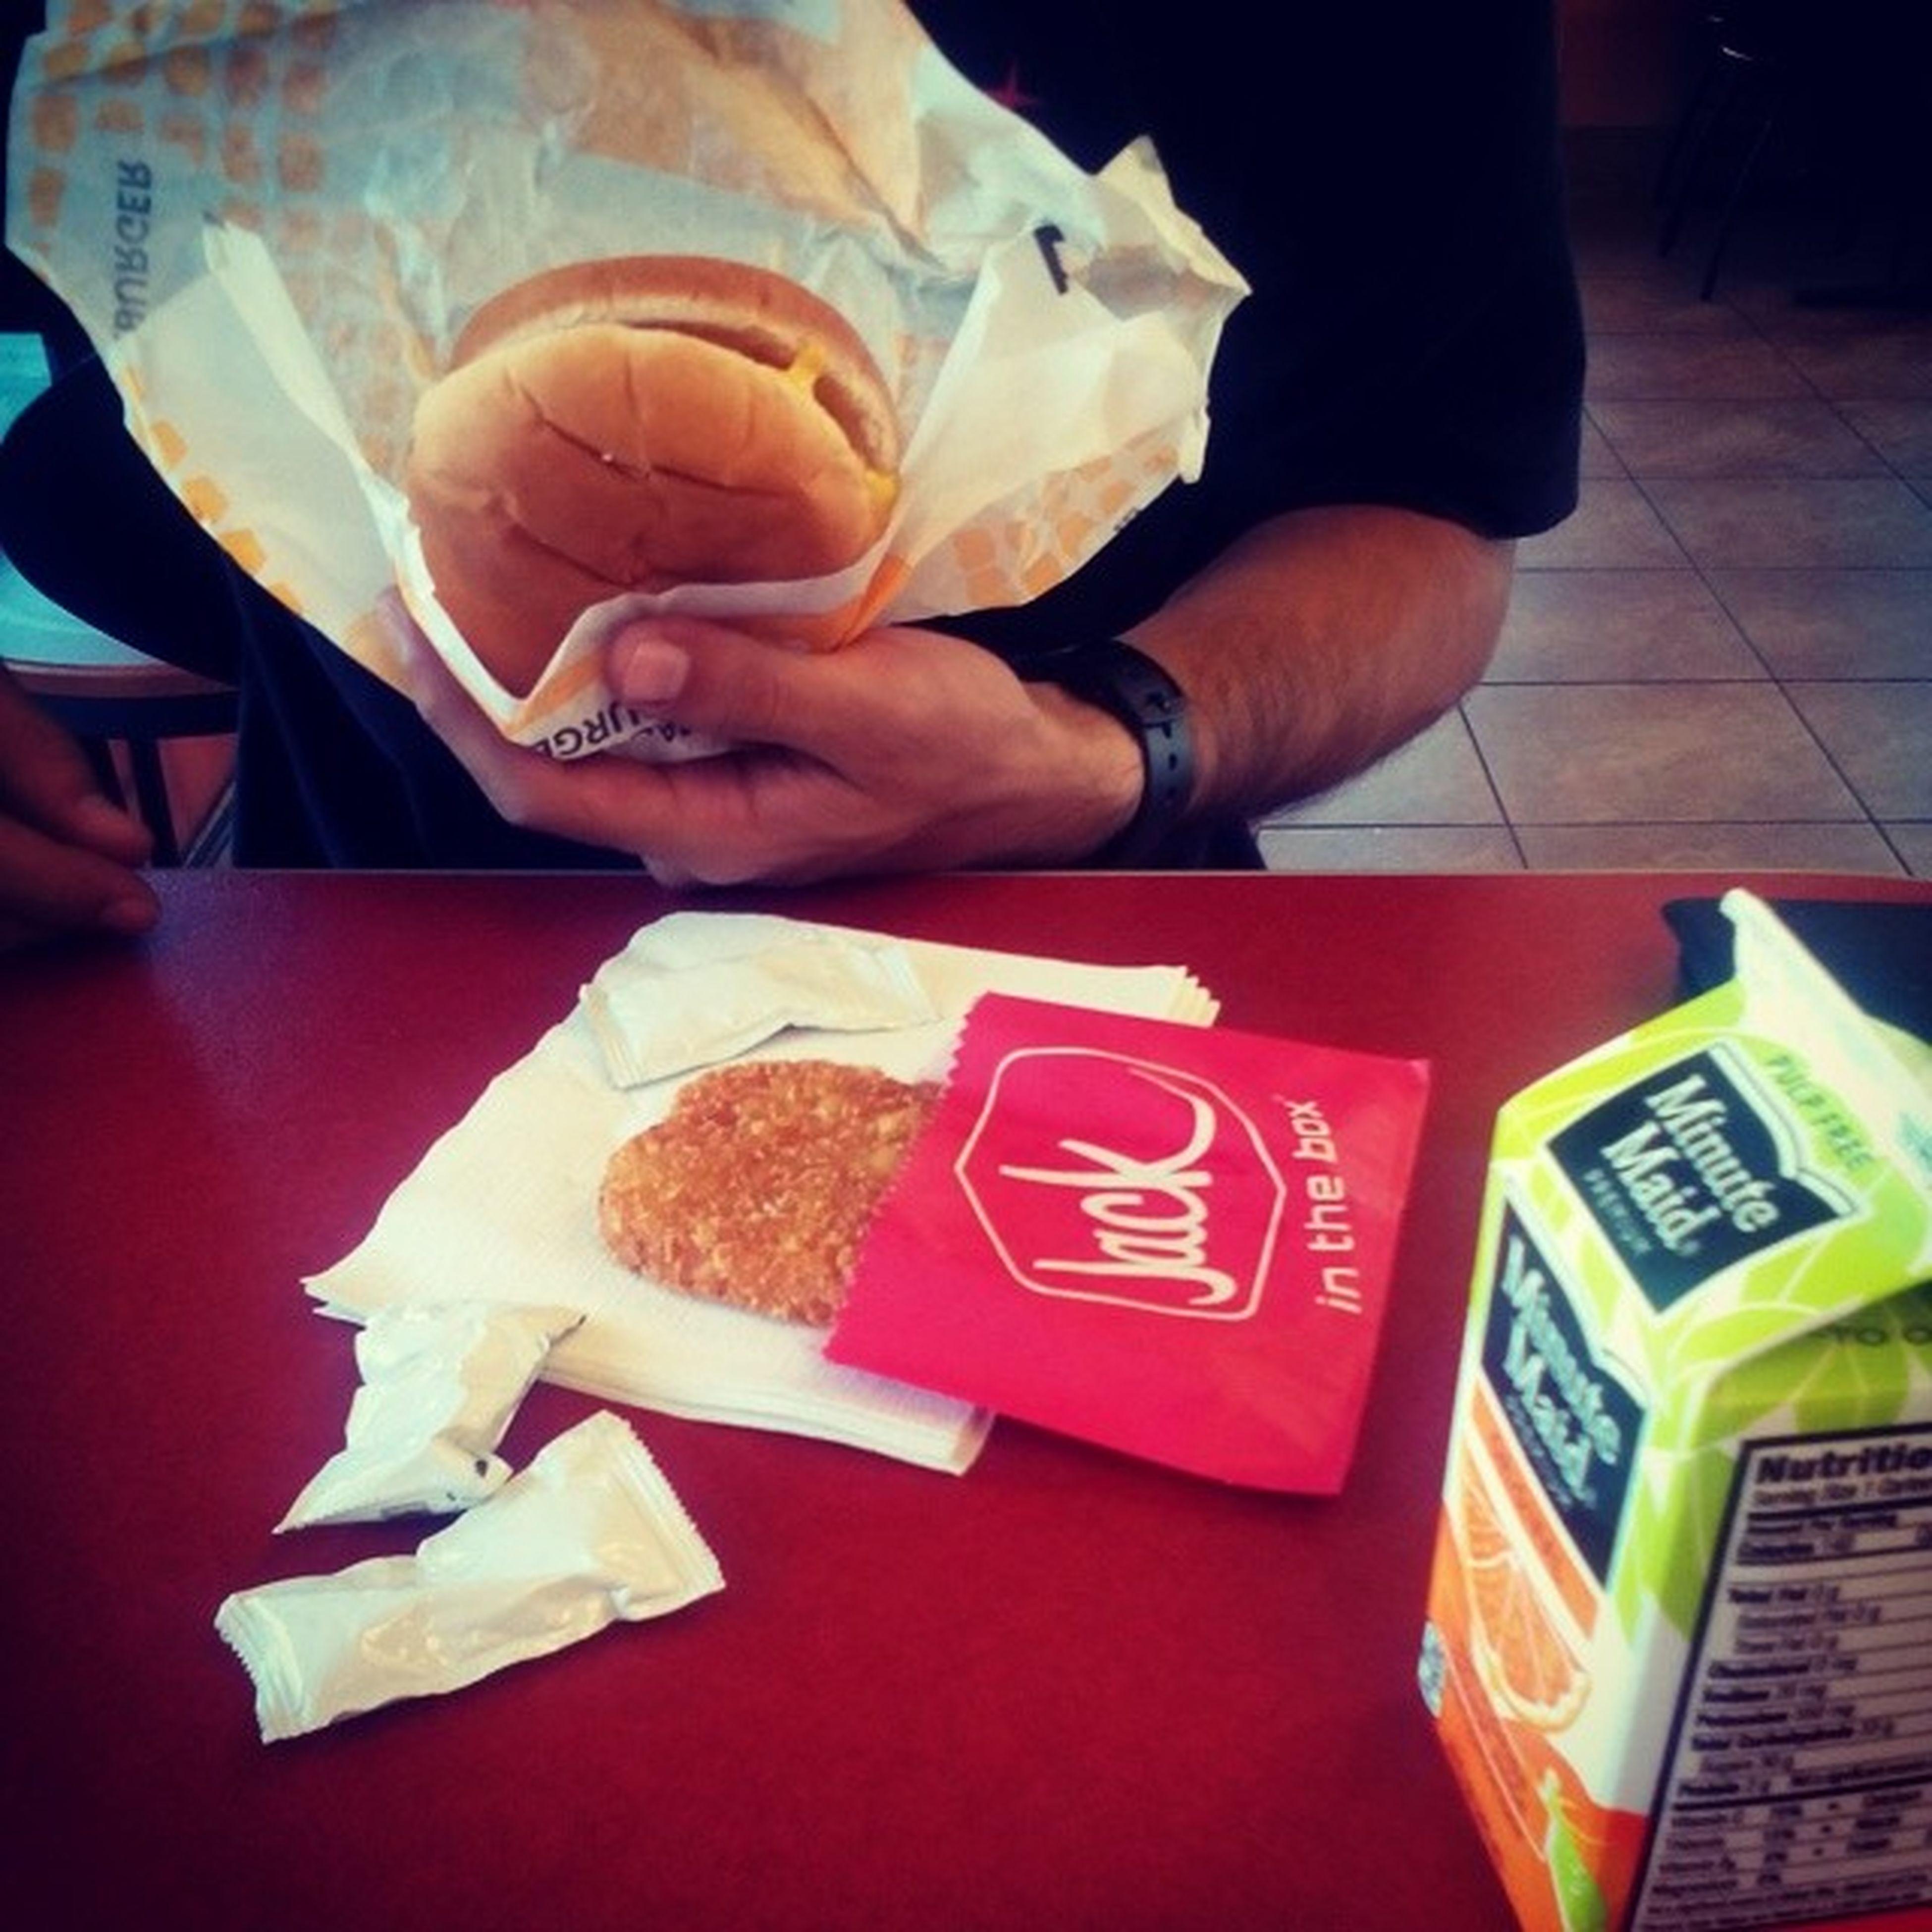 I think the breakfast speaks for itself ...JackInTheCrack Breakfast